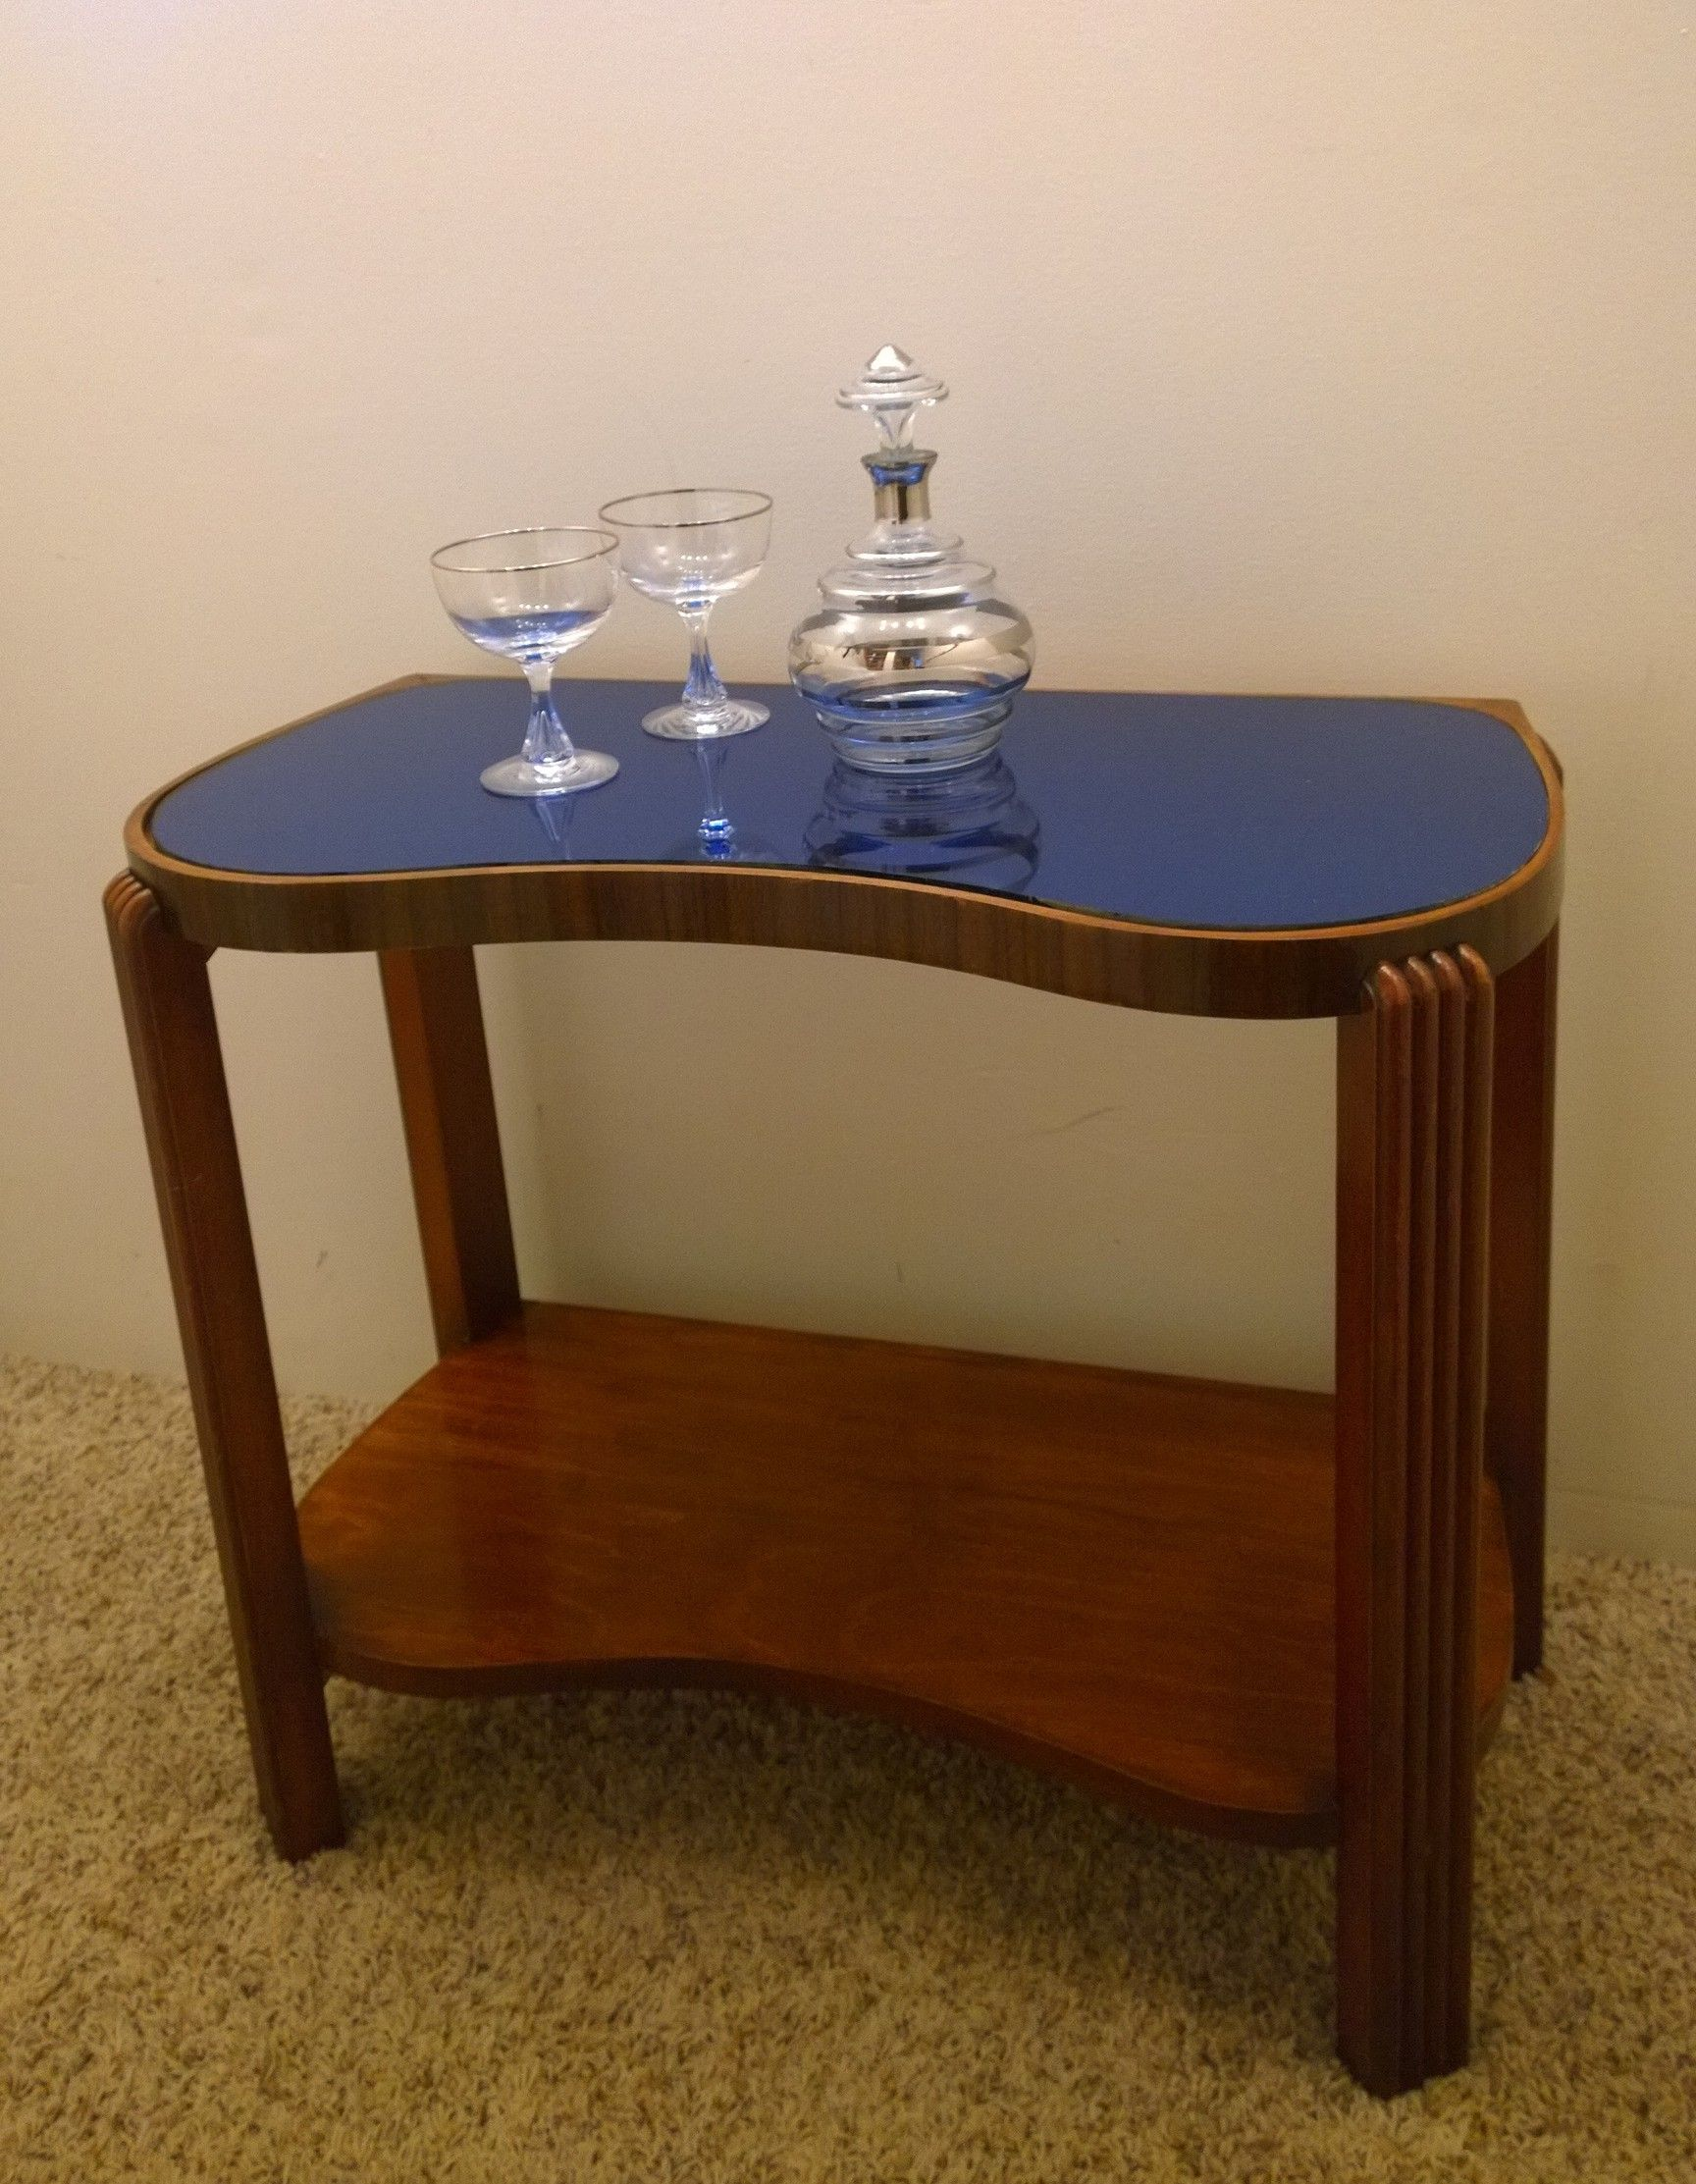 Cobalt Blue Mirror Art Deco 1930s Table The Most Beautiful Deep Blue Glass Blue Mirrors Art Deco Mirror Vintage House [ 2225 x 1728 Pixel ]